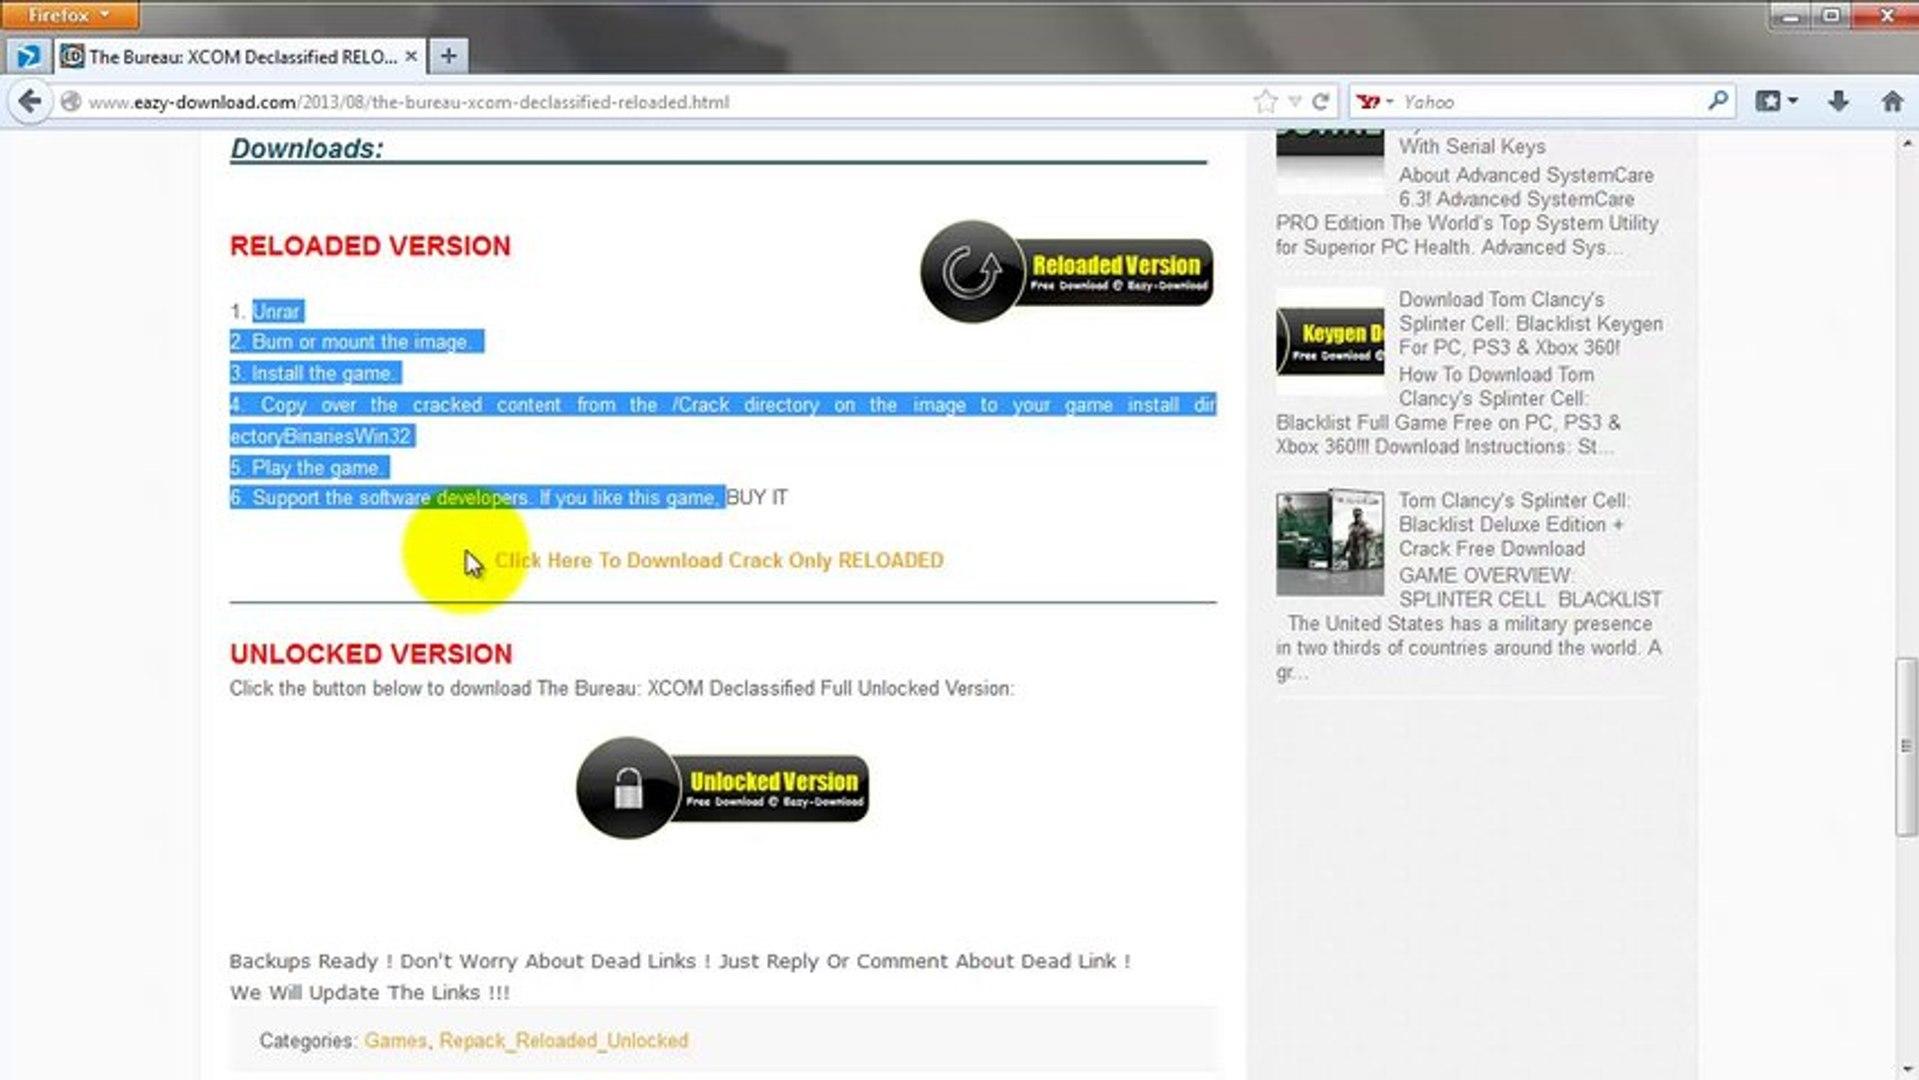 Download The Bureau: XCOM Declassified Crack + Reloaded_repack_unlocked  Version